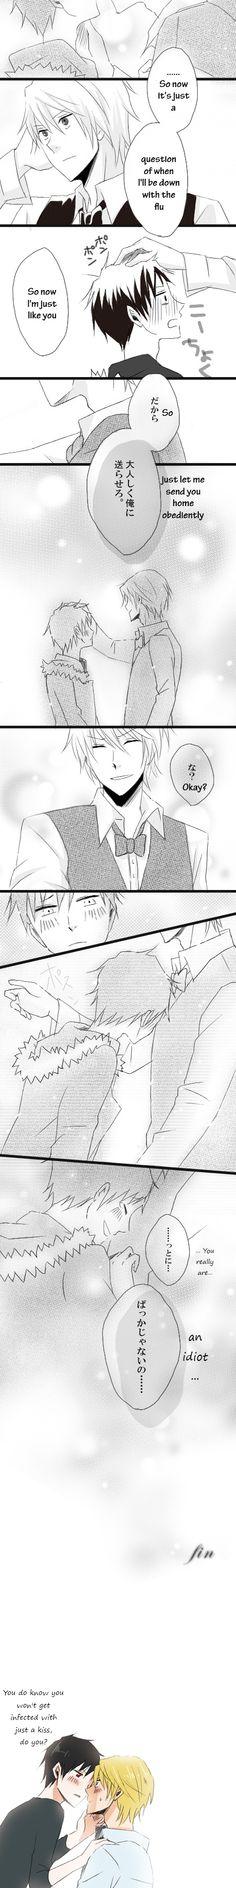 Shizuo bring Izaya back home 5/5